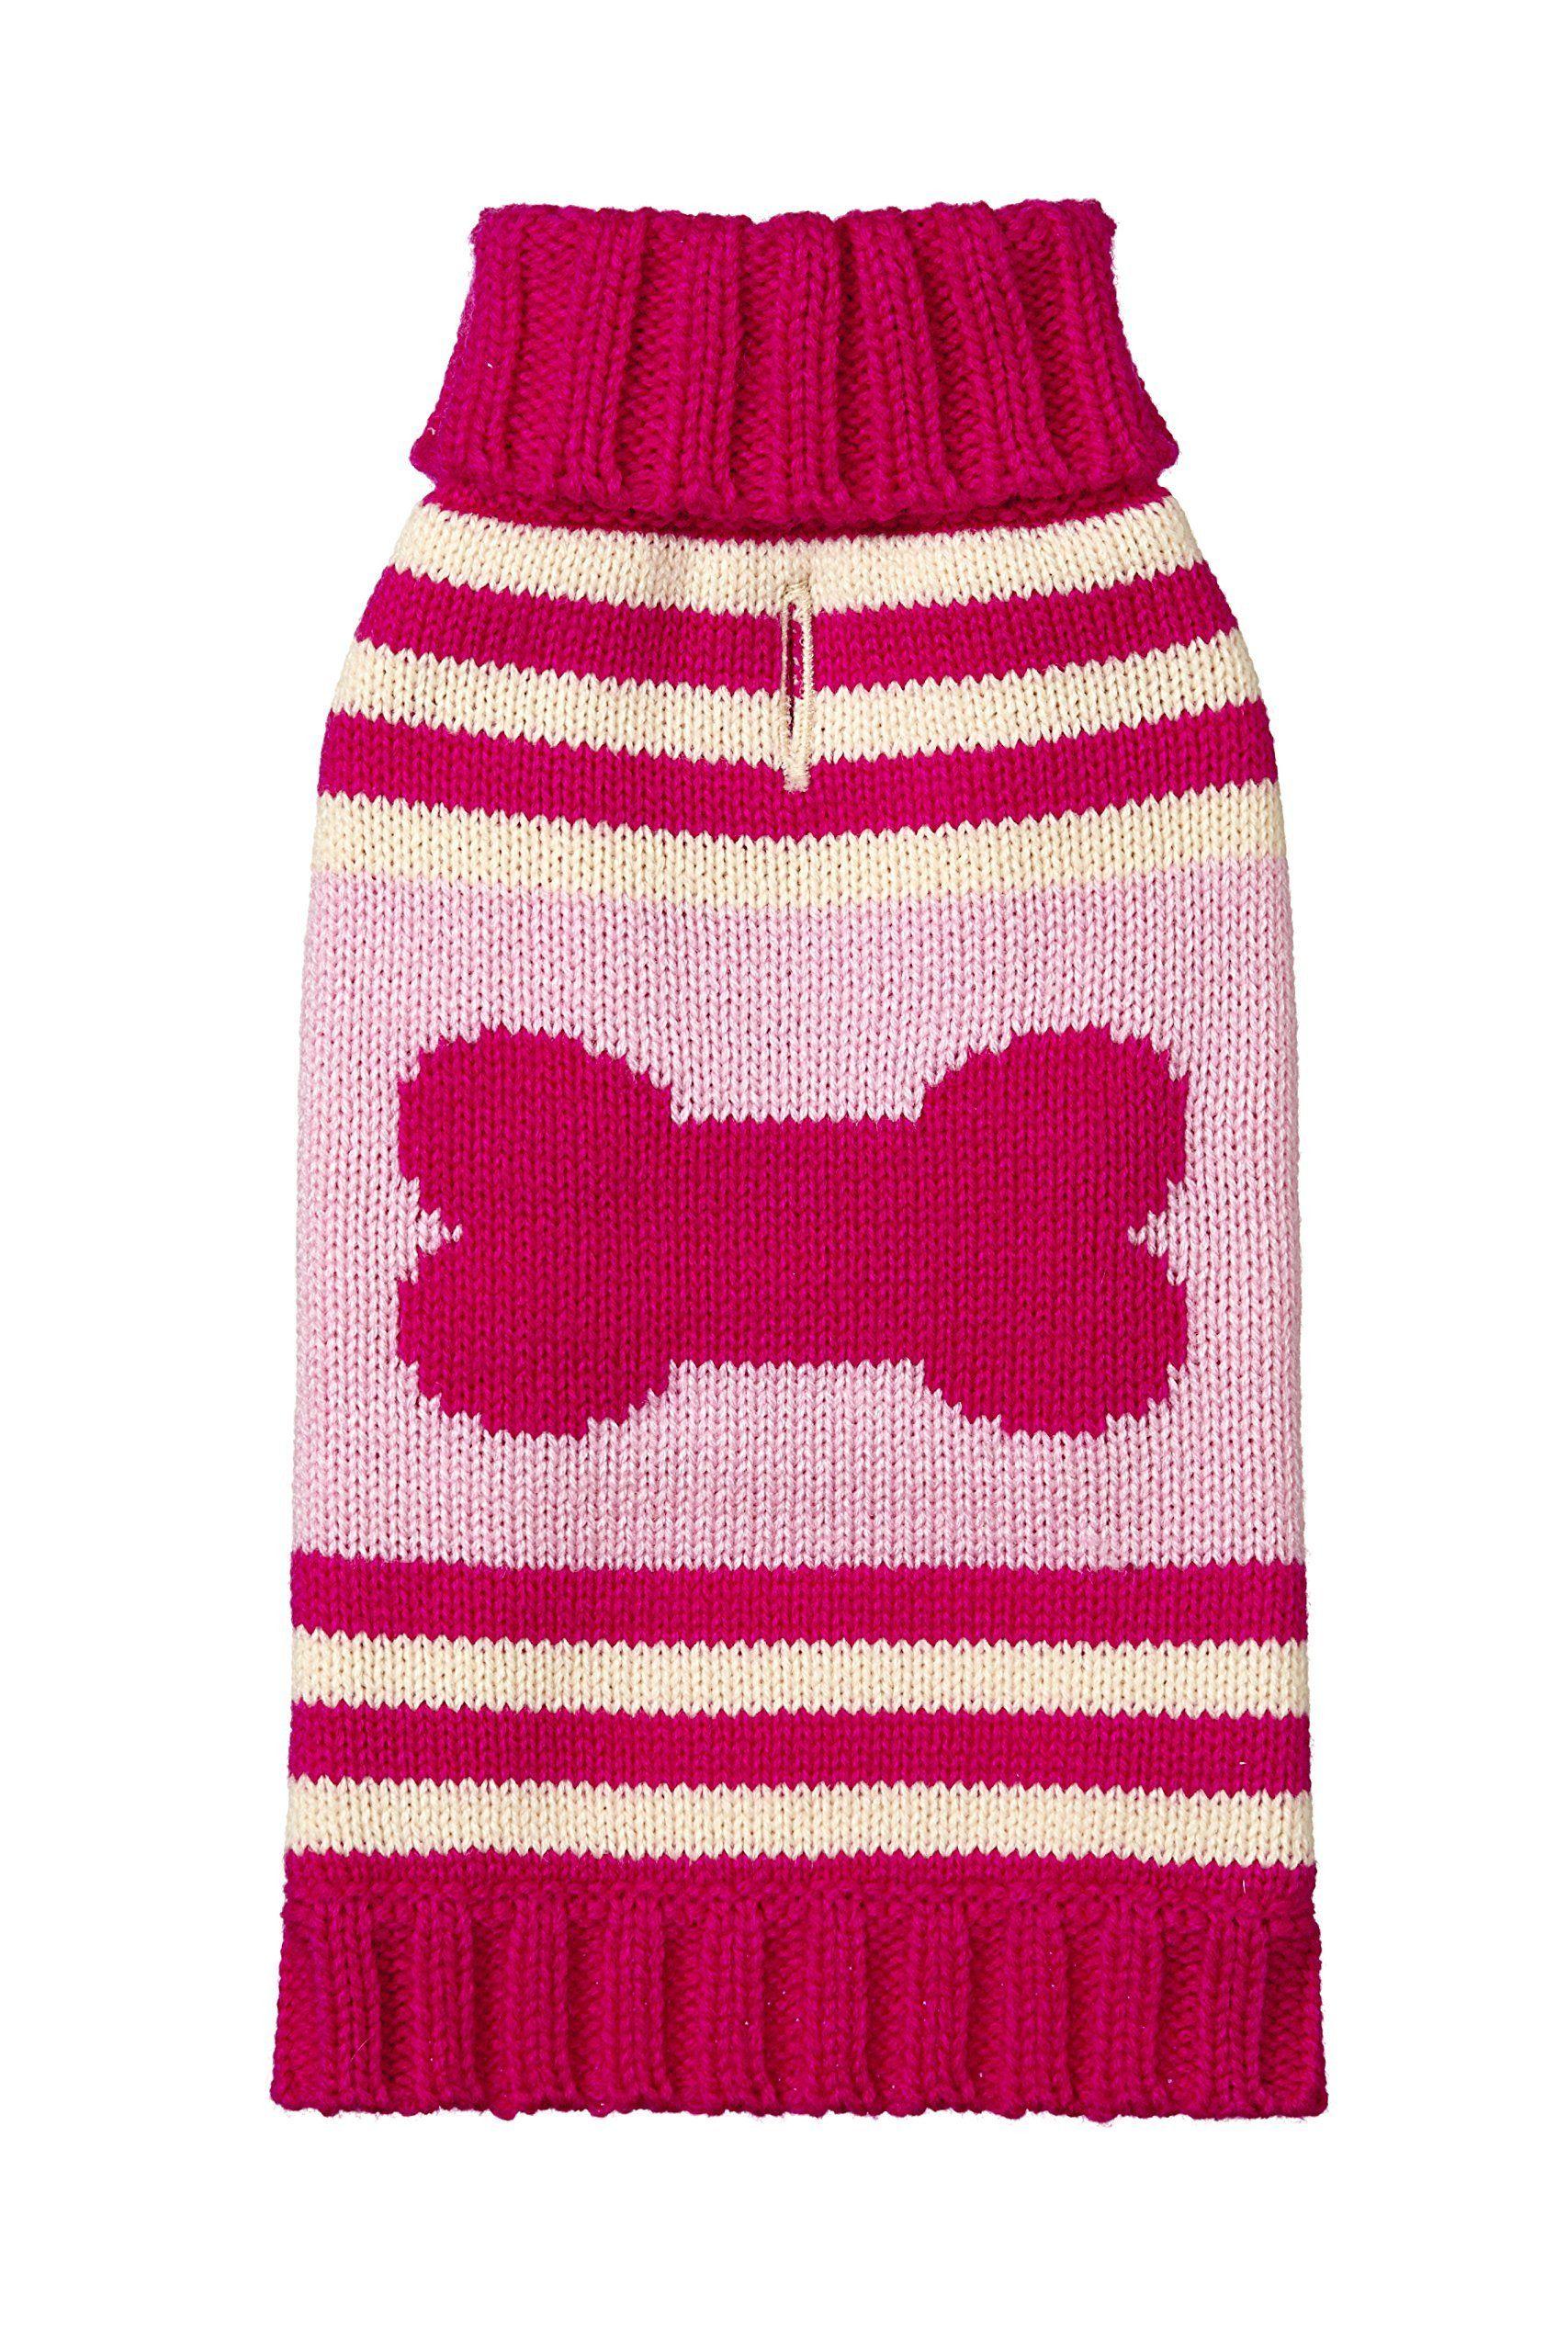 Fab Dog Knit Turtleneck Dog Sweater Striped Bone Hot Pink/Pink 8 ...